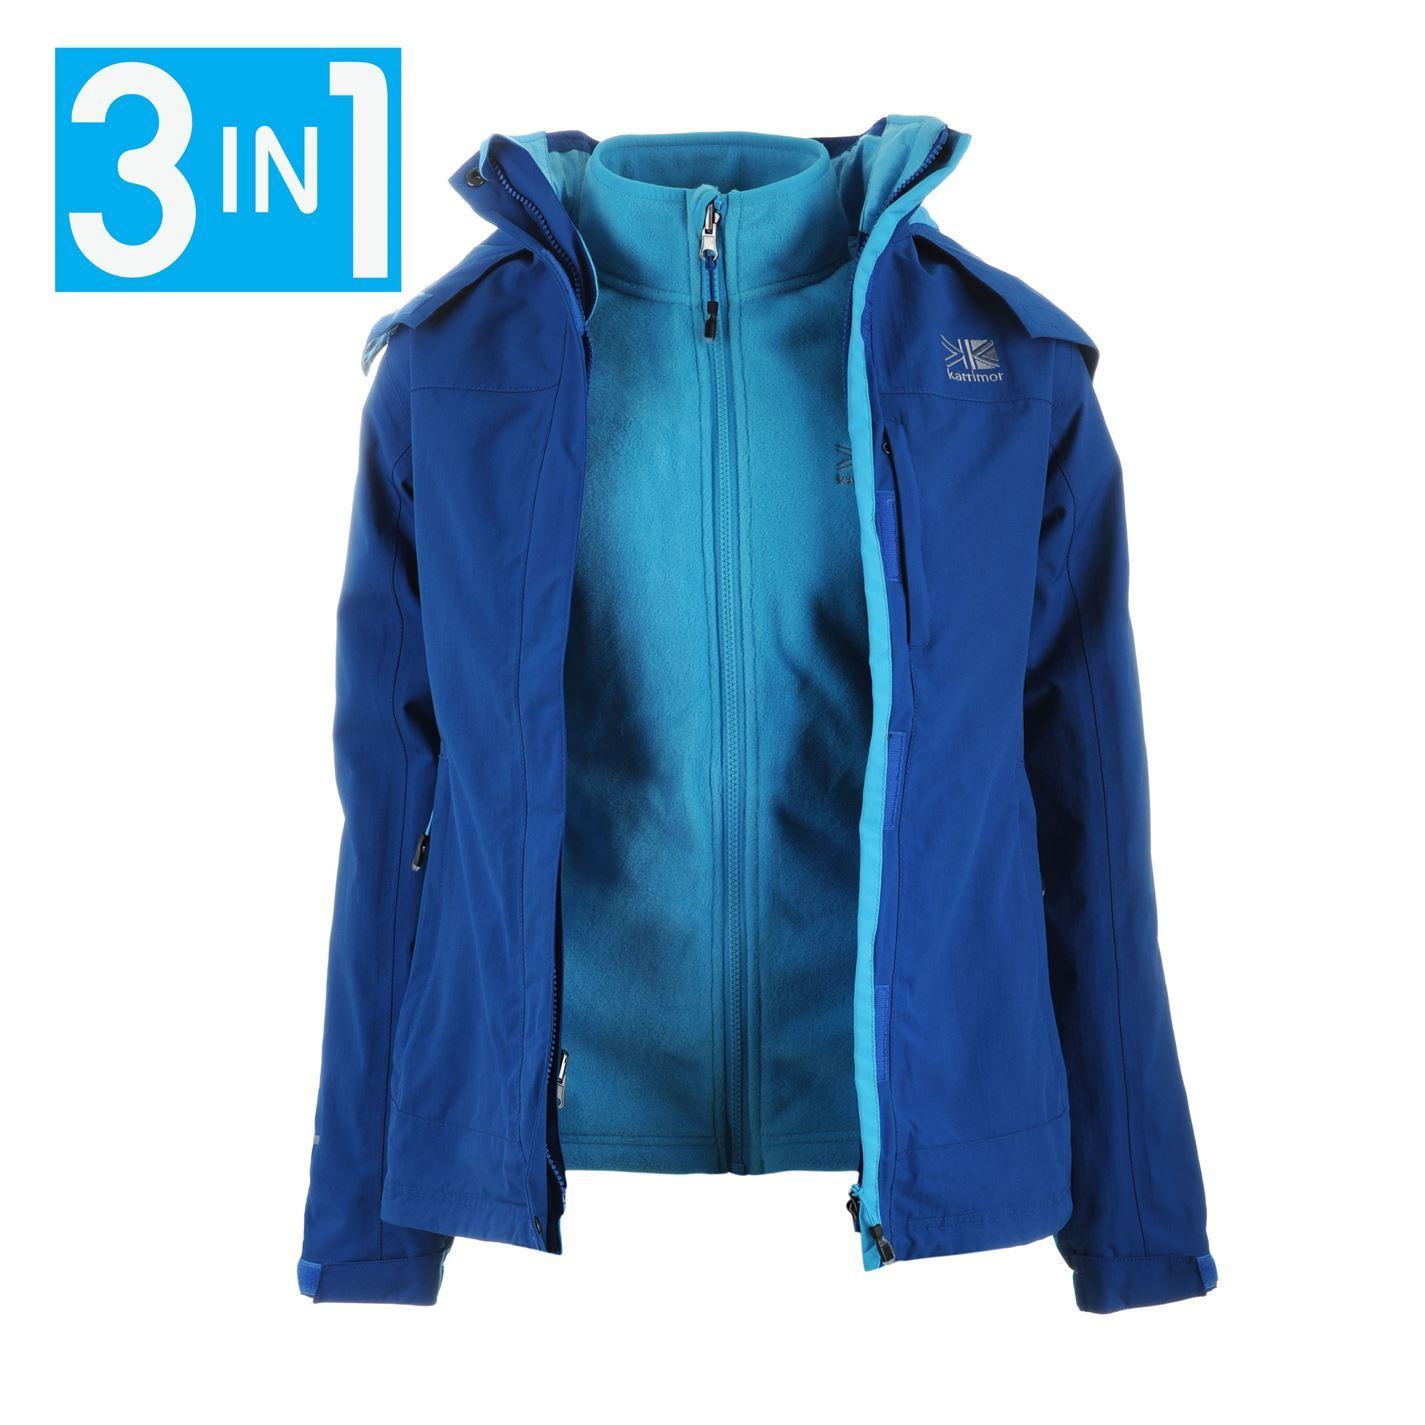 Womens sport coats